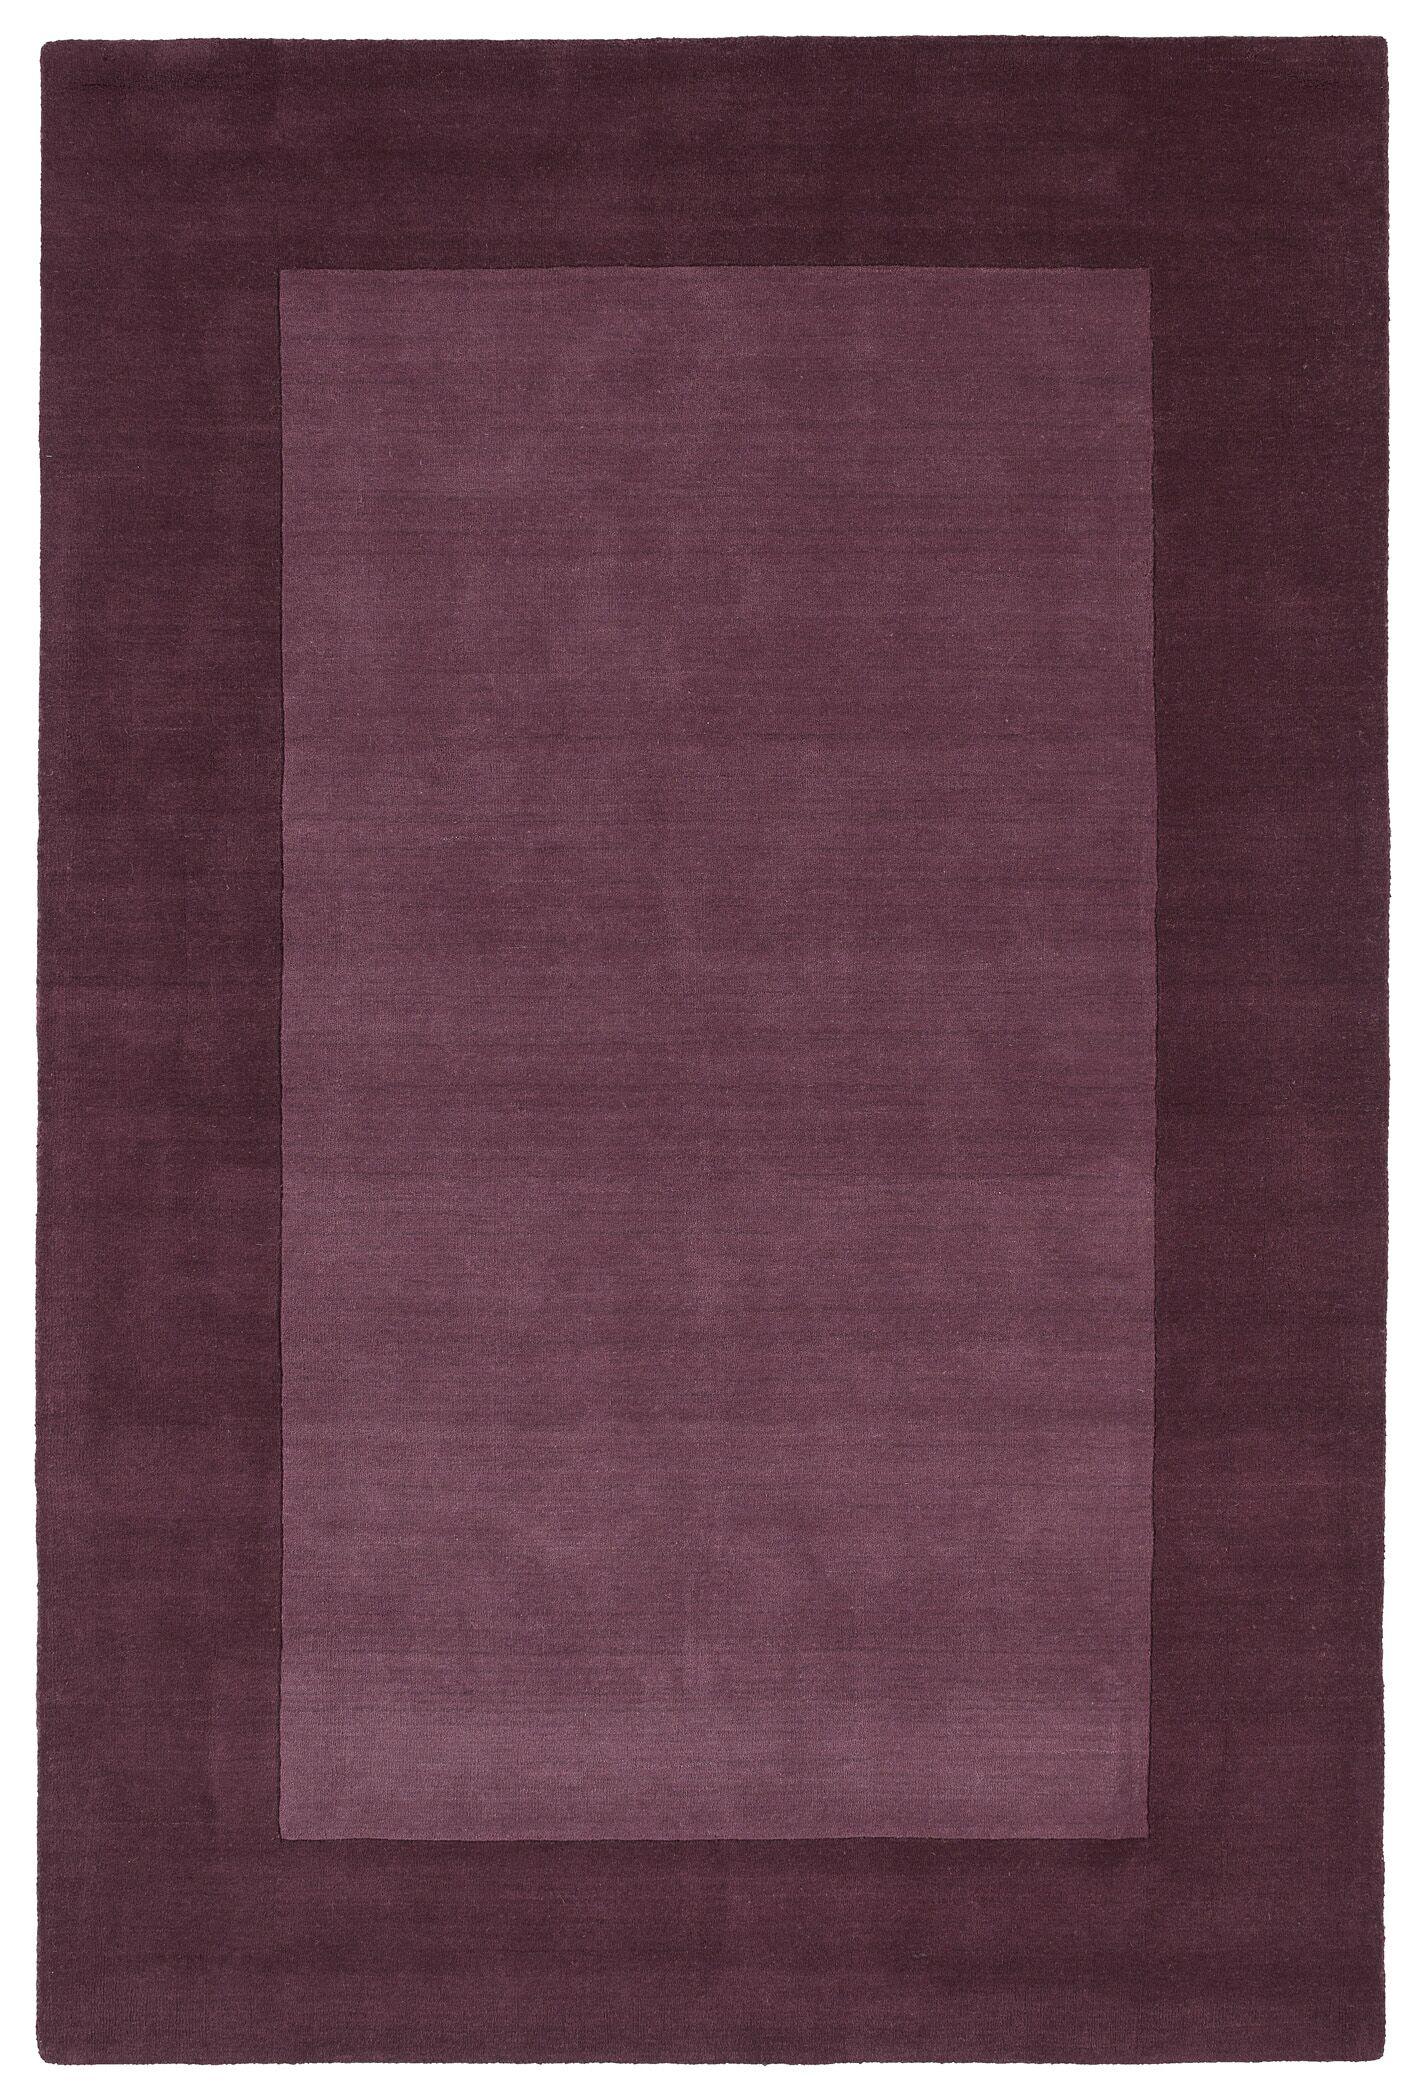 Barnard Hand Tufted Purple Area Rug Rug Size: Rectangle 5' x 7'9